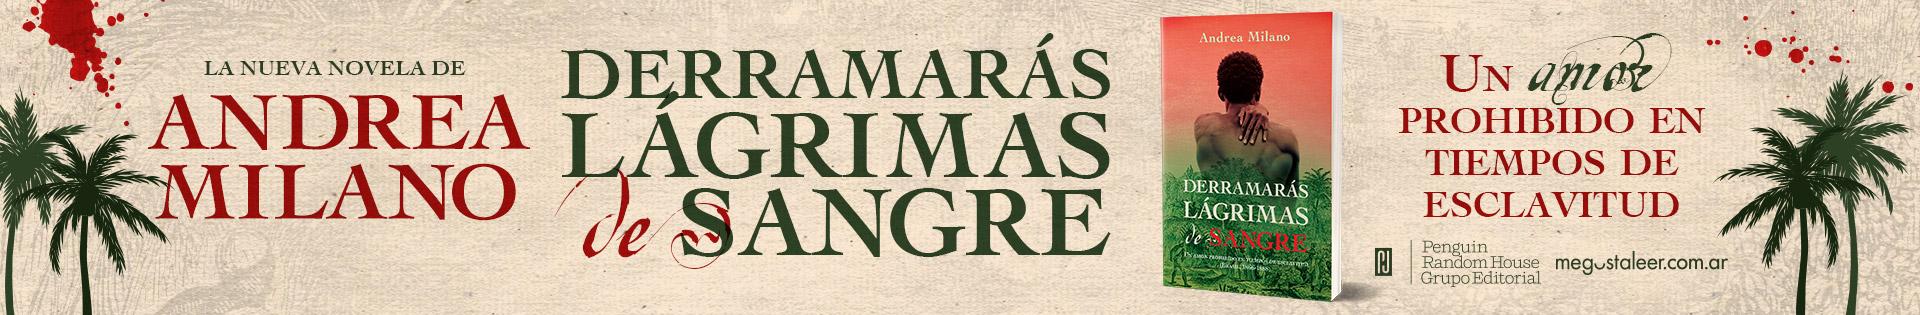 DERRAMARAS LAGRIMAS DE SANGRE- > Ficcion